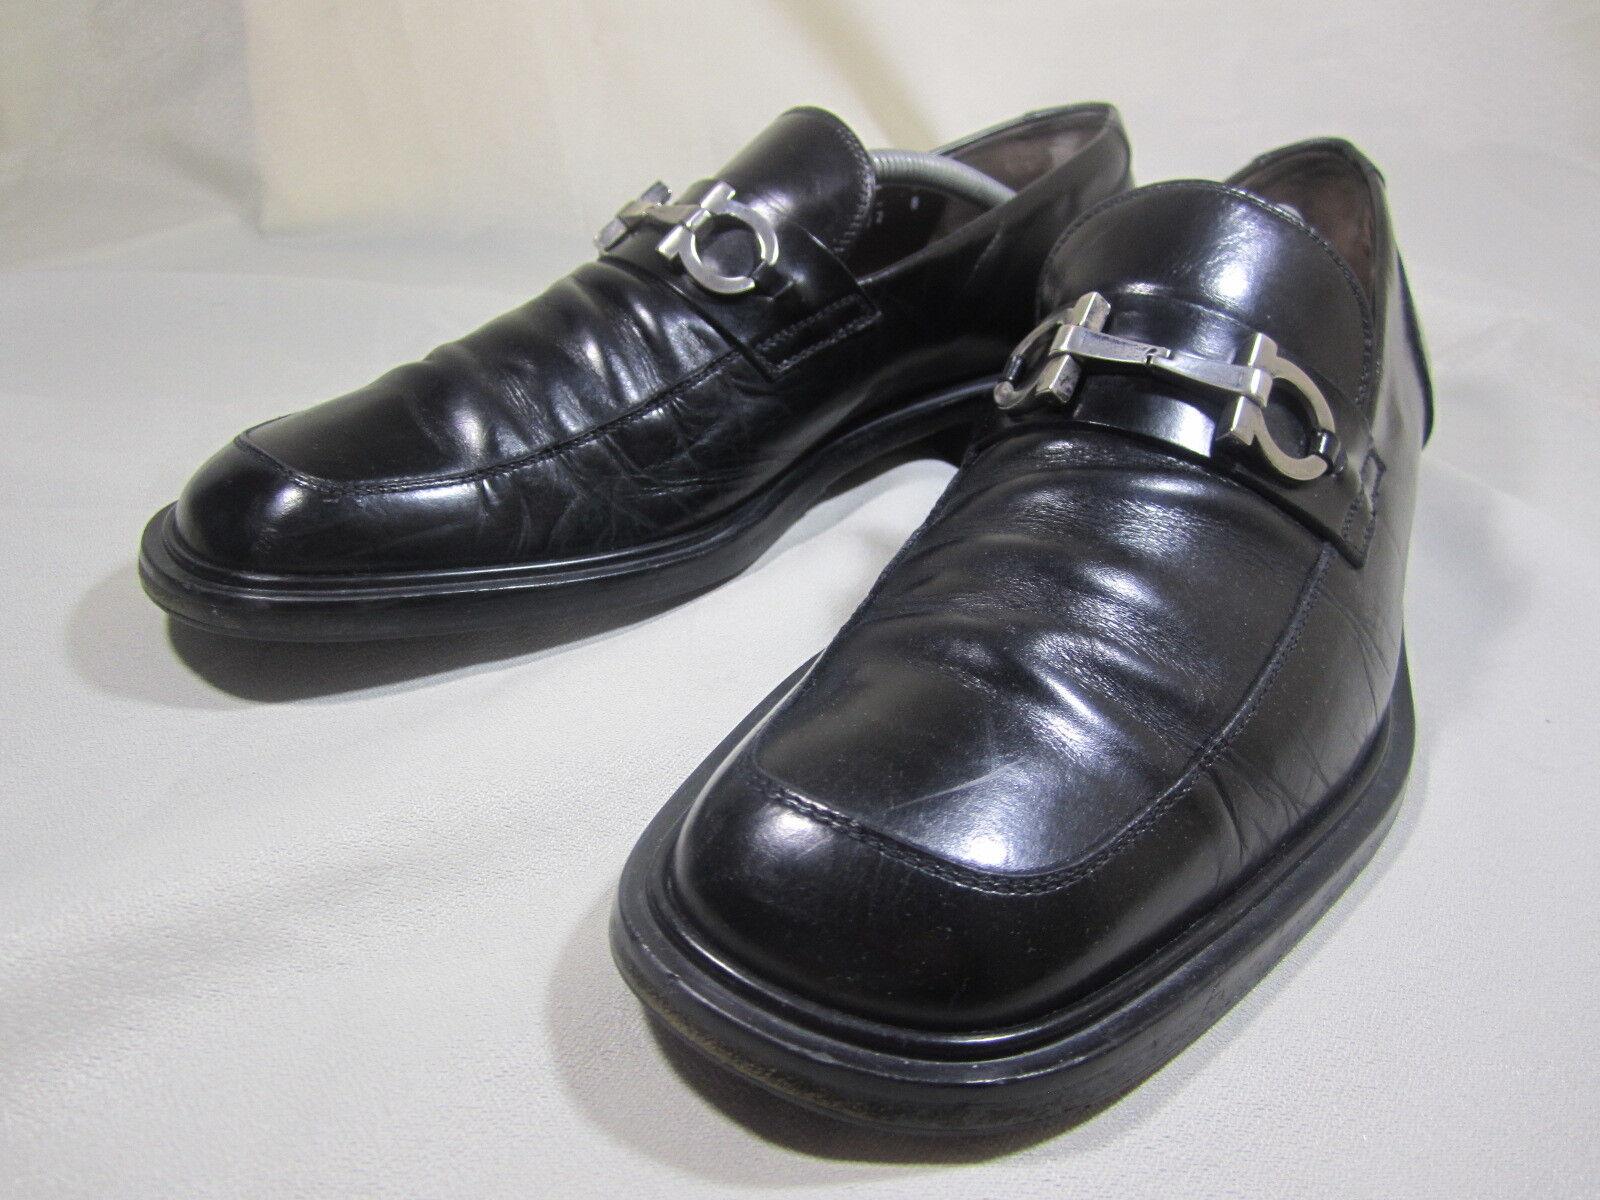 SALVATORE FERRAGAMO STUDIO Gun Métal Embout en Cuir Noir Chaussures Mocassins Taille 8D